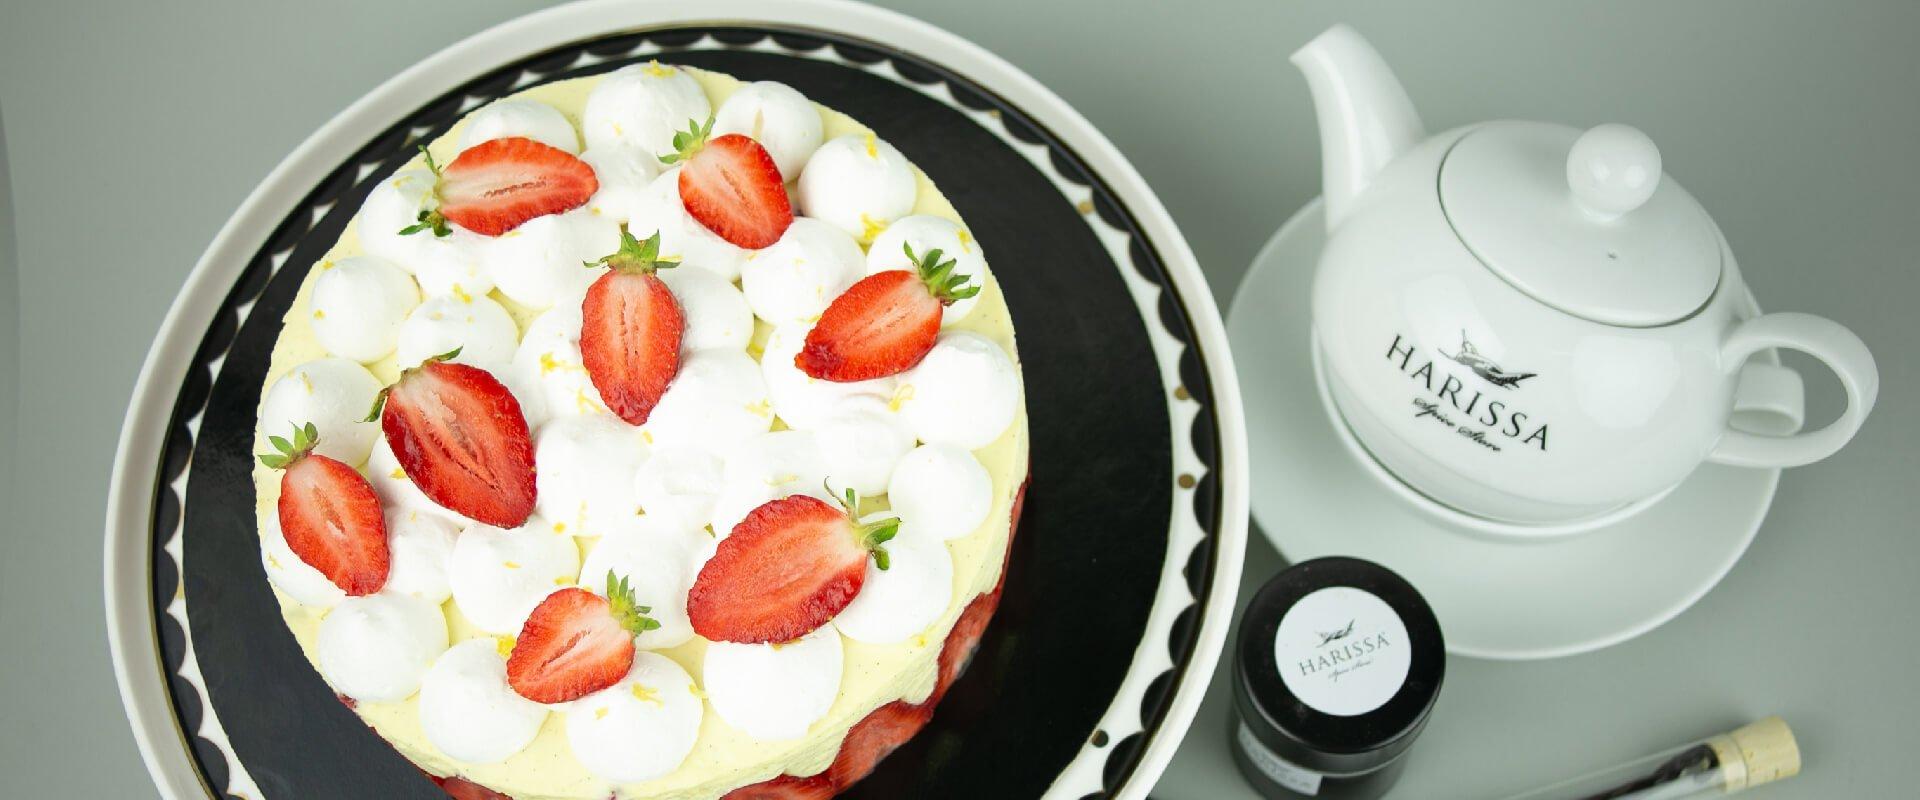 Article-hero-image-jagode kolač.jpg